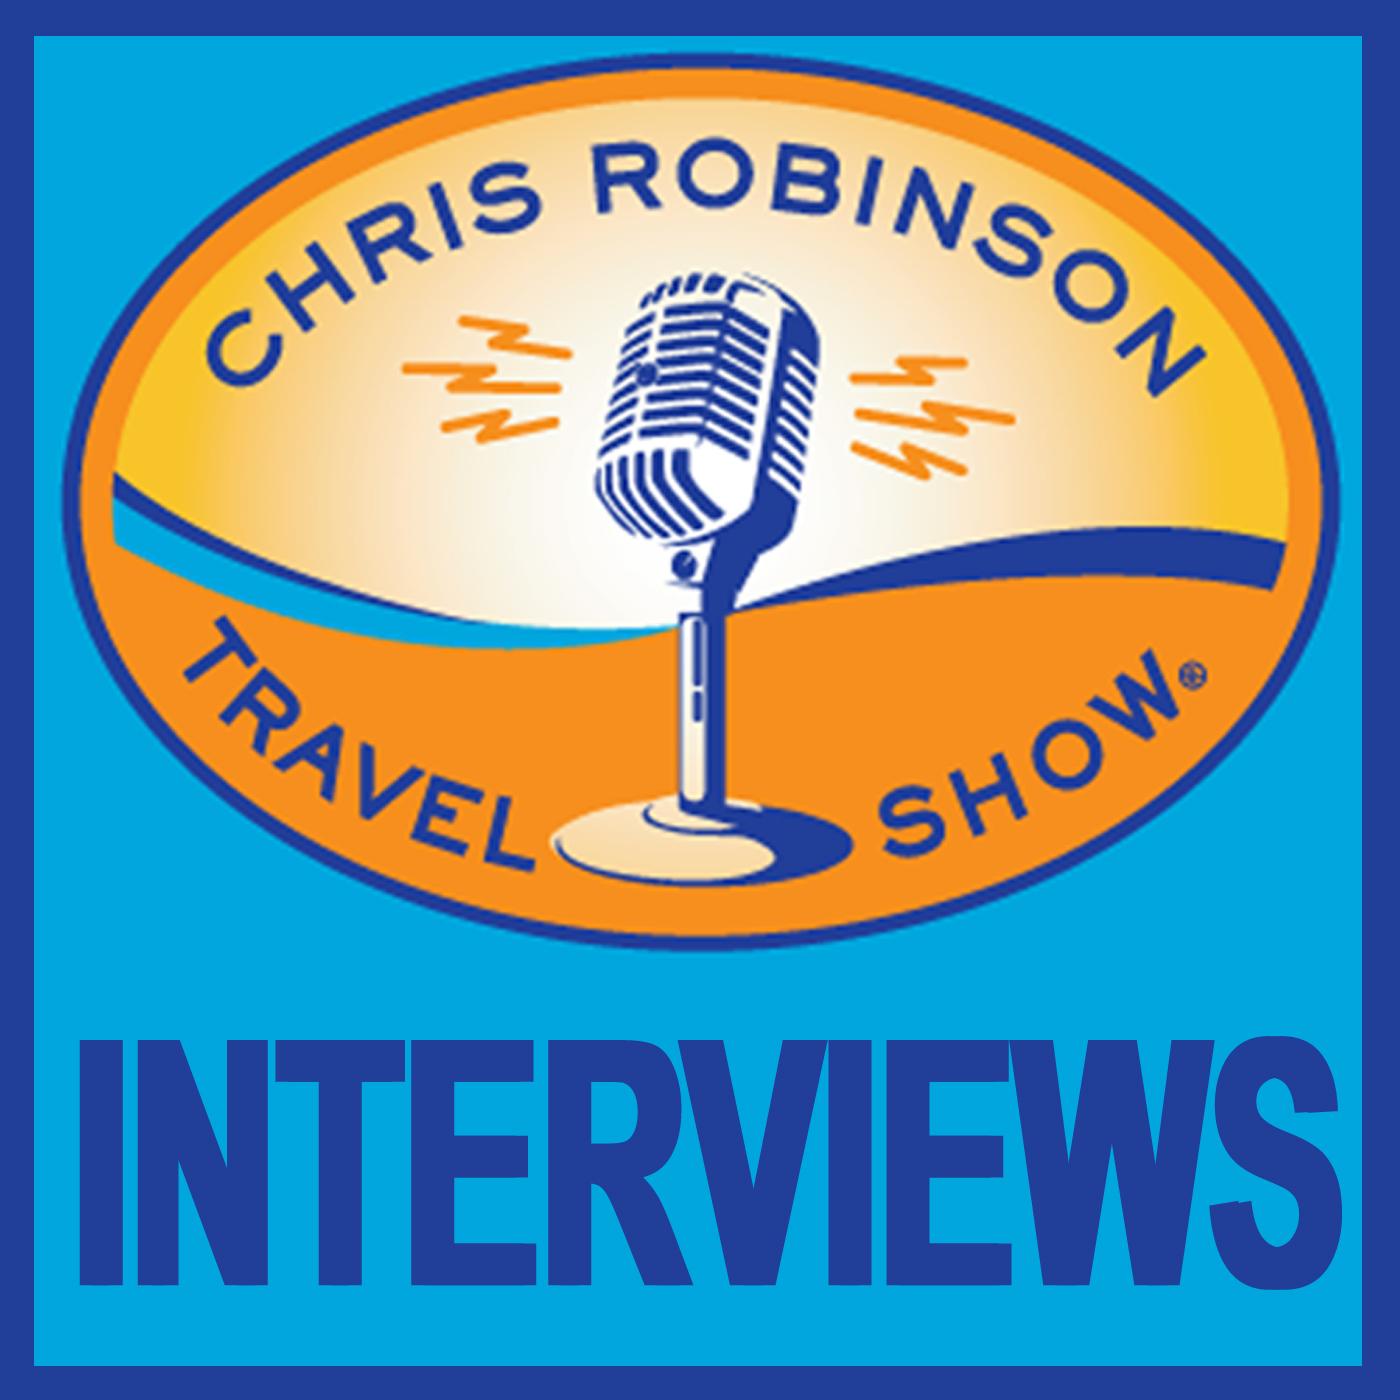 Chris Robinson Travel Show - Interviews